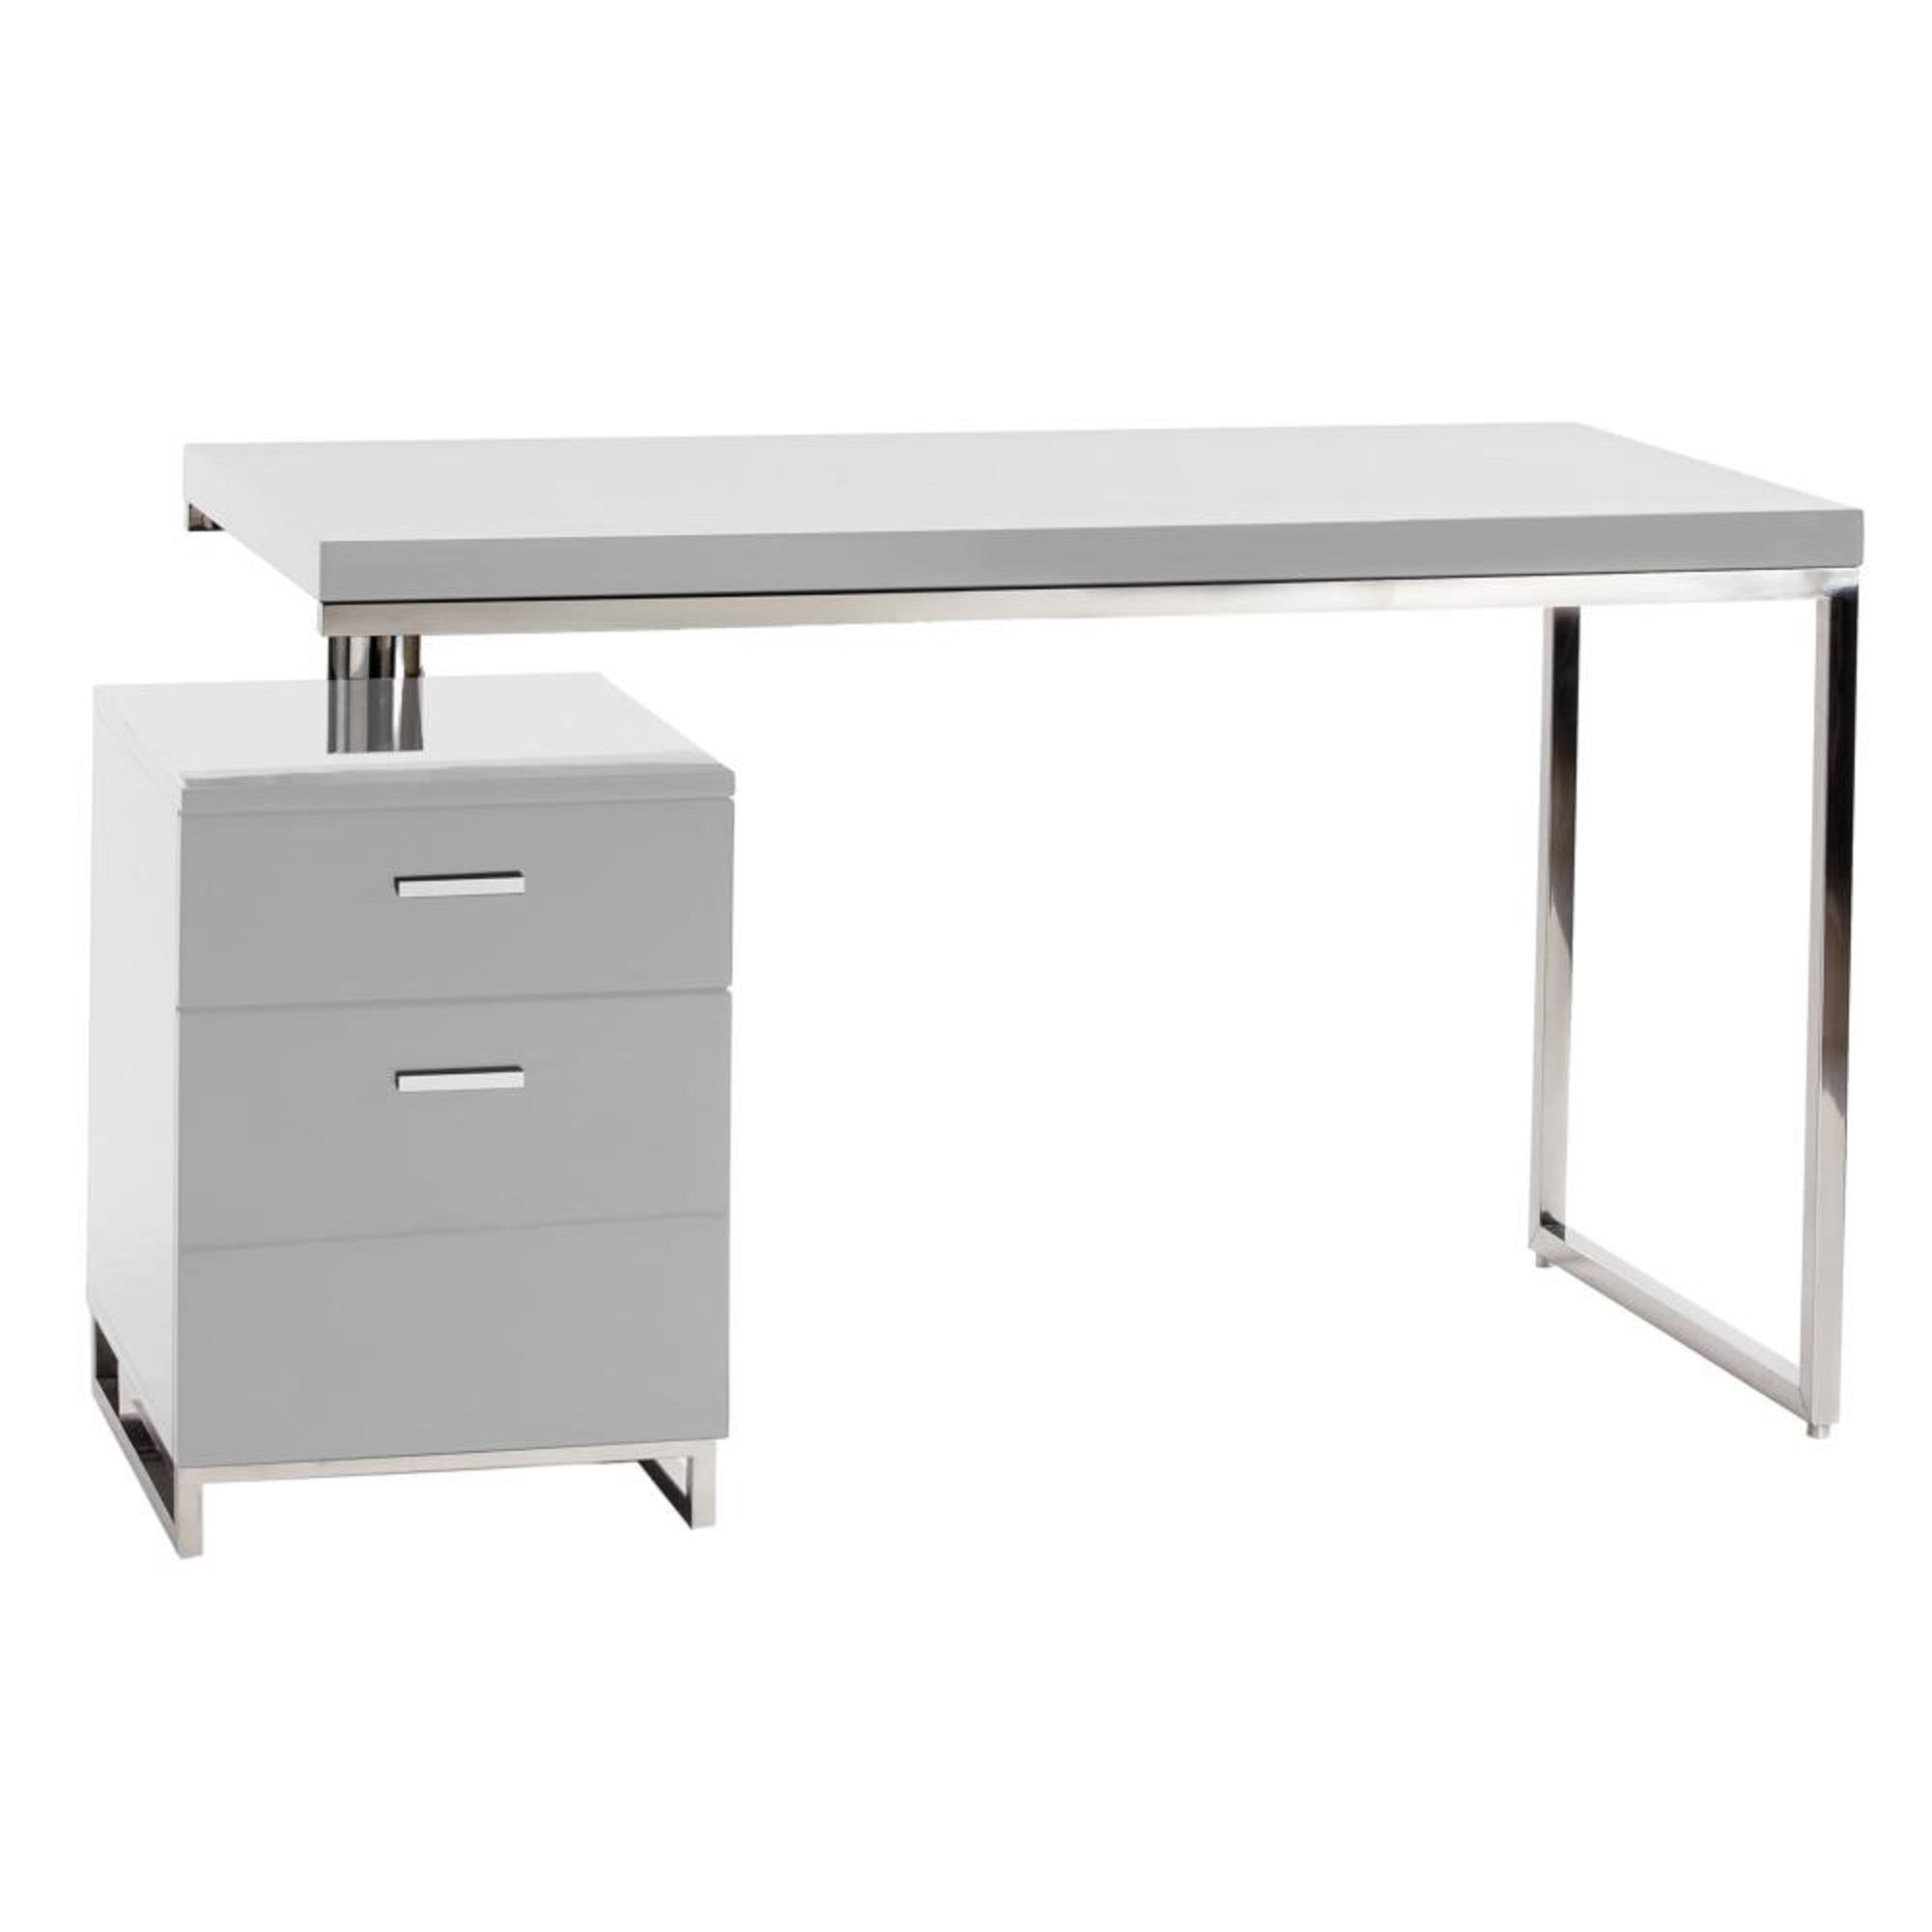 Contemporary Design Desk With Filing Cabinet Moe S Home Collection Desk Design White Desks White desk with file cabinets